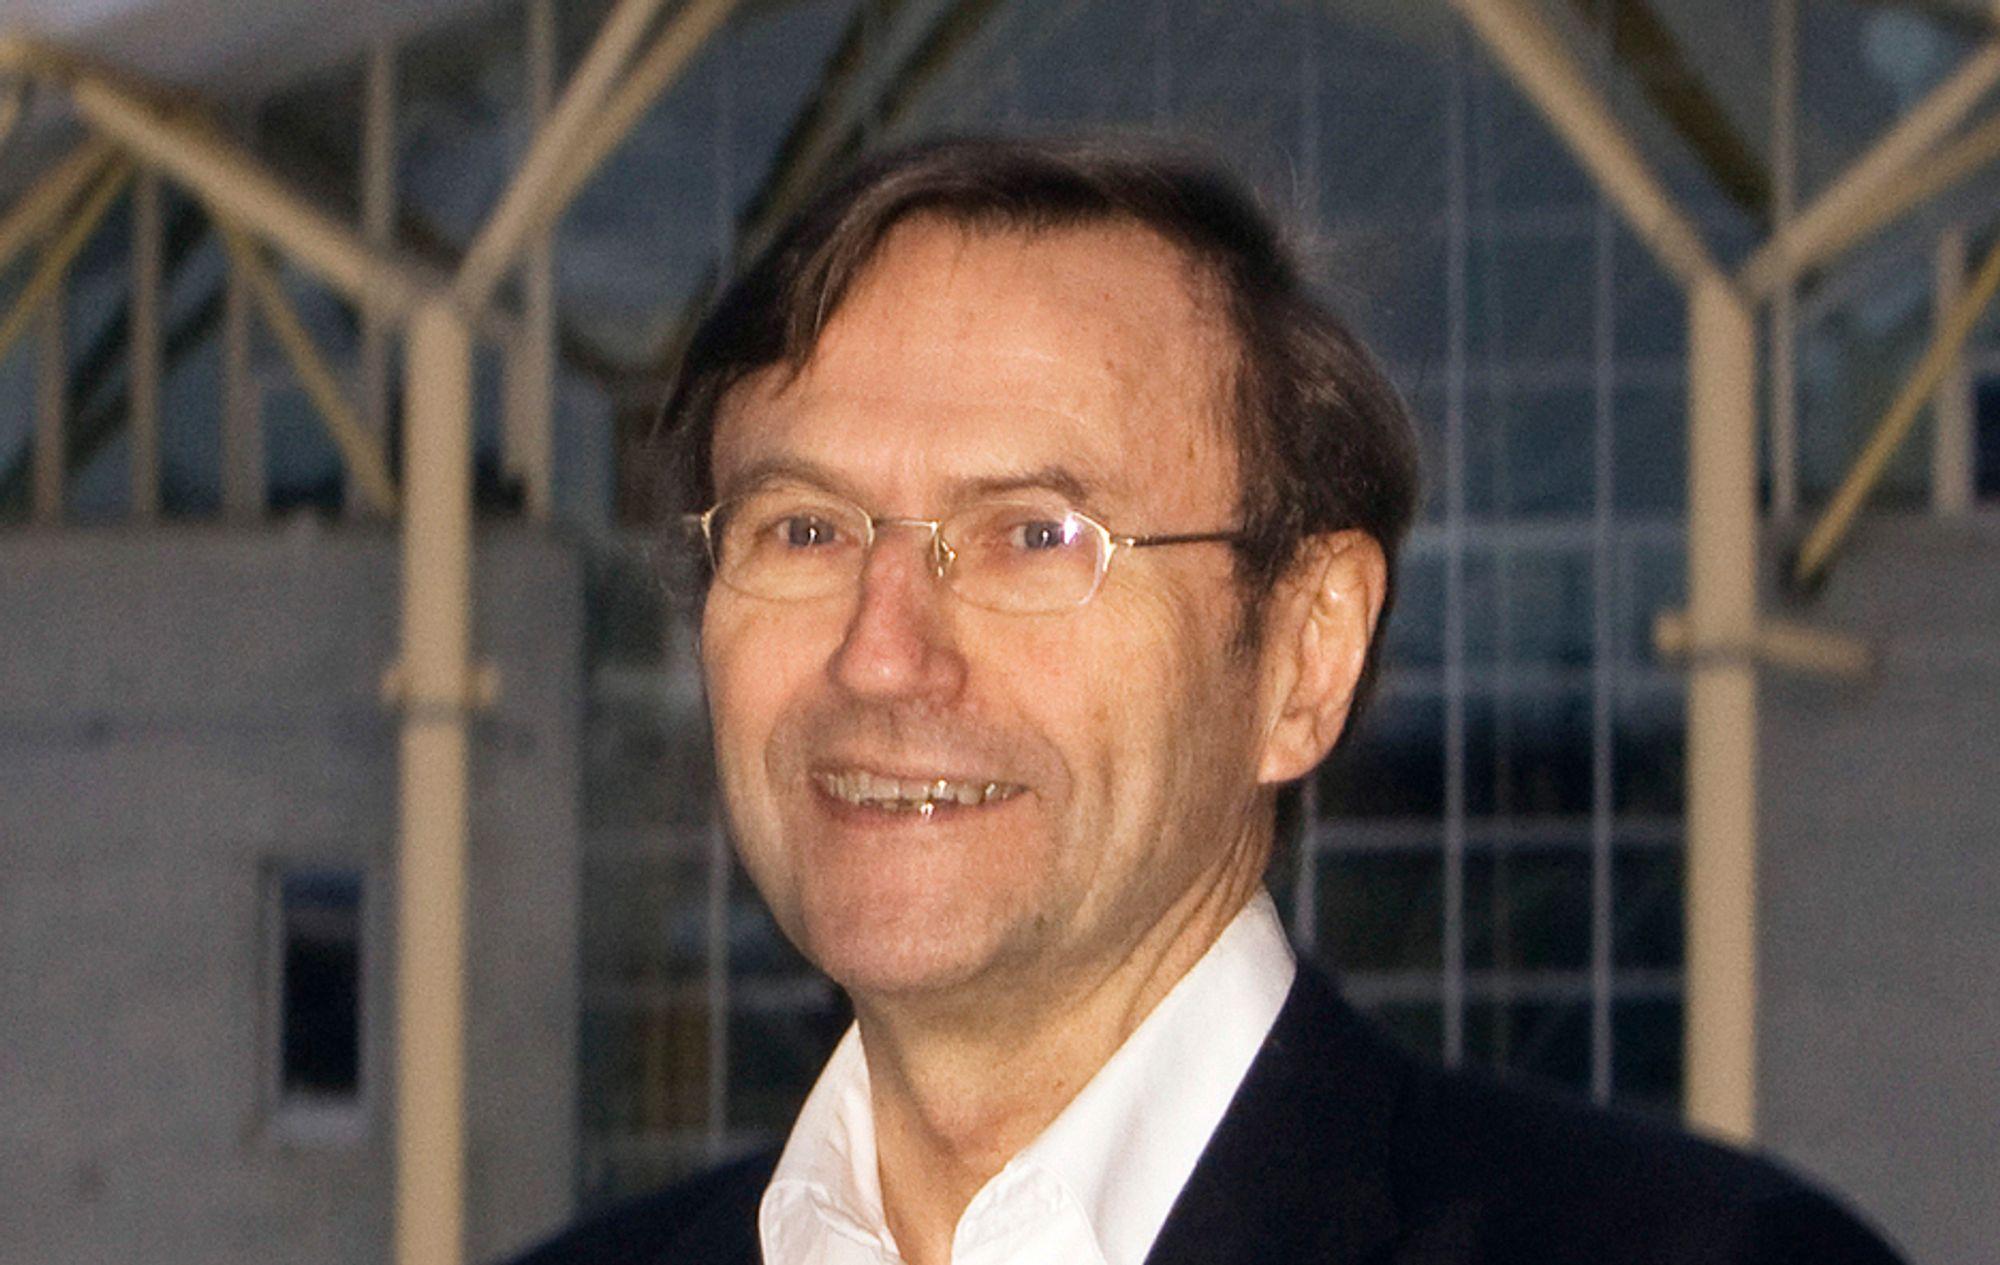 Jarle Aarbakke, rektor ved Universitetet i Tromsø.